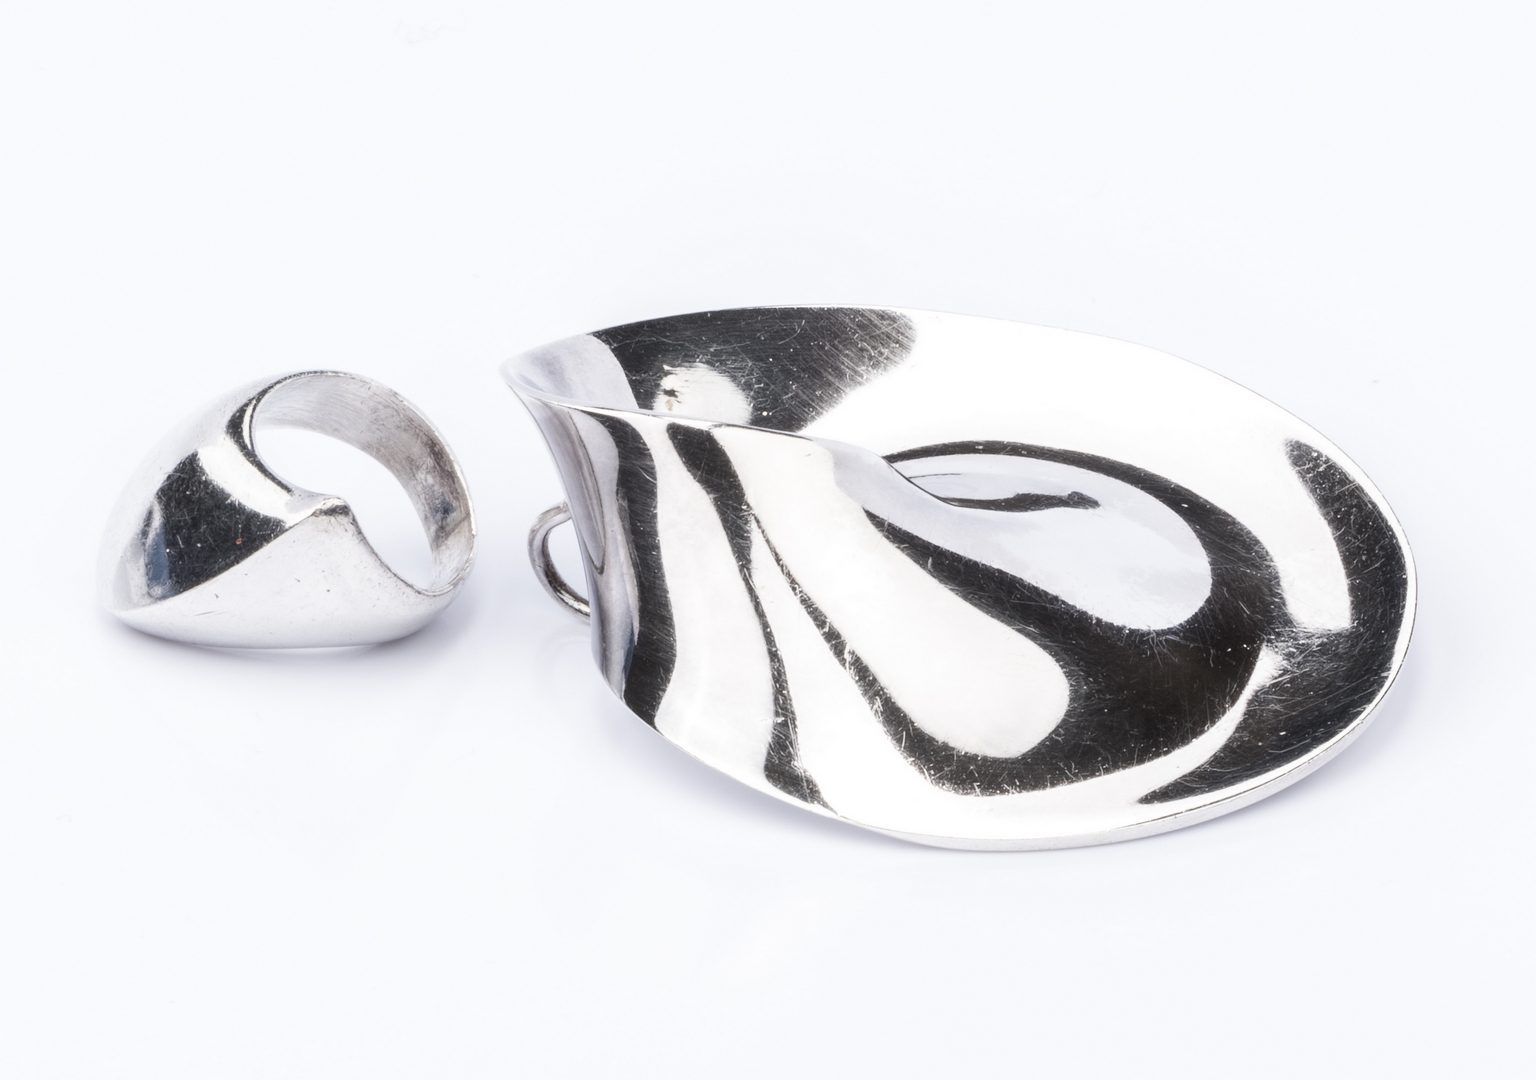 Lot 849: 2 George Jenson Modernist Silver Jewelry Items